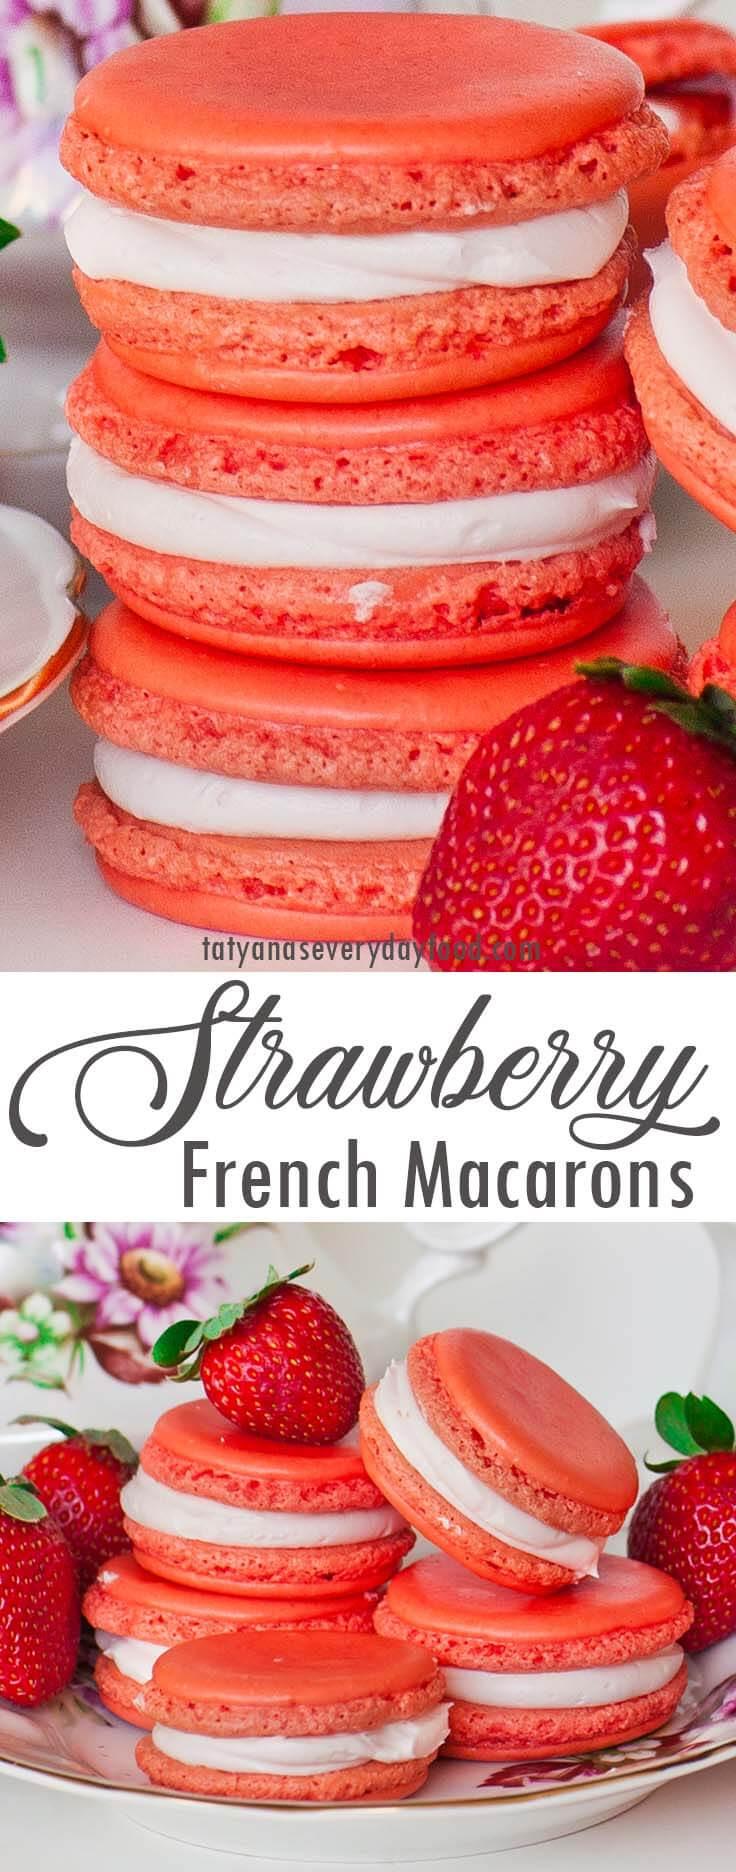 Triple Strawberry Macarons video recipe